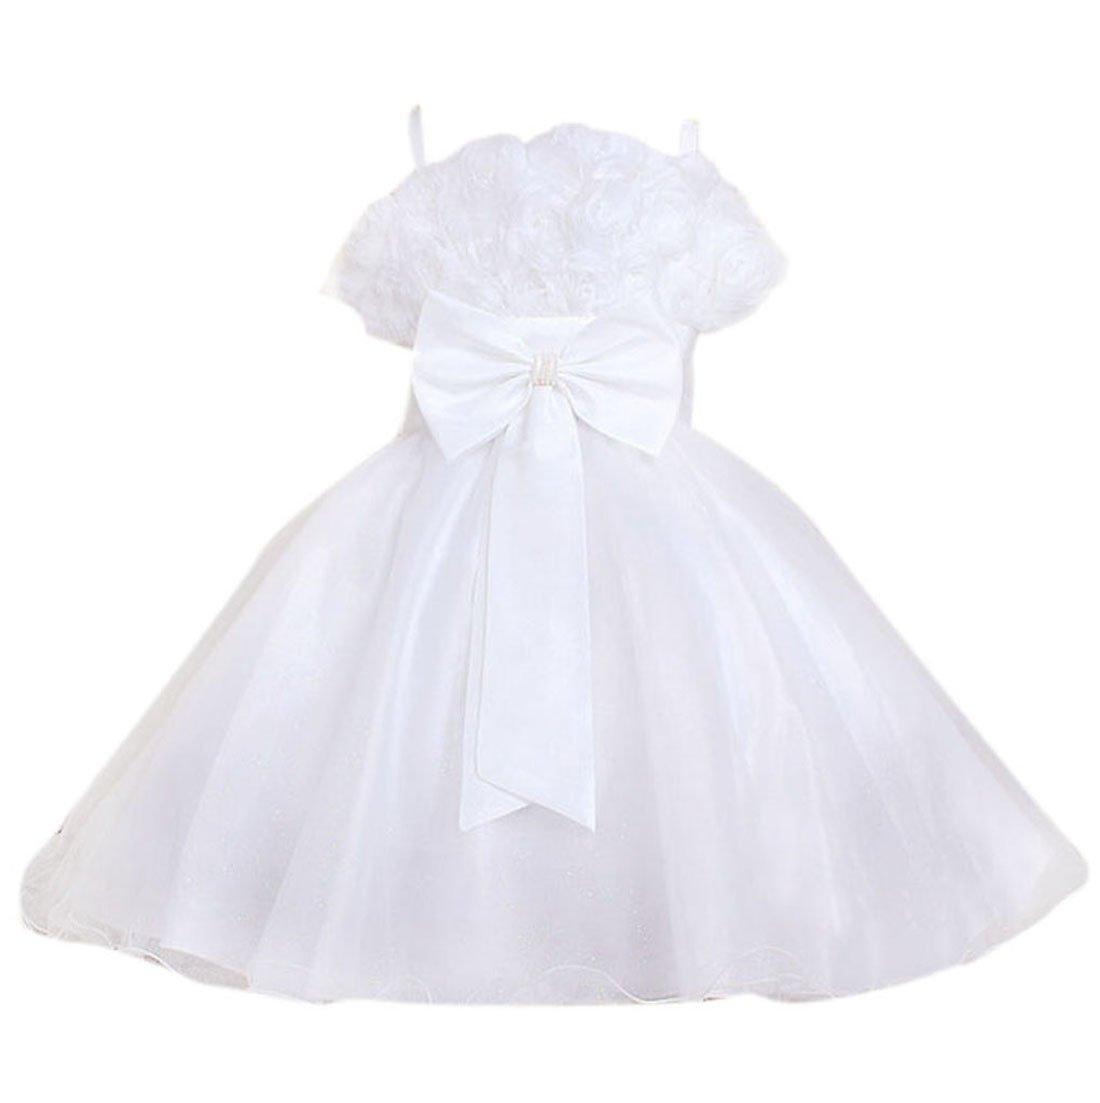 Fancy Dress, Girls Satin Dresses For Communion Holiday Travel Birthday 7-8Yrs